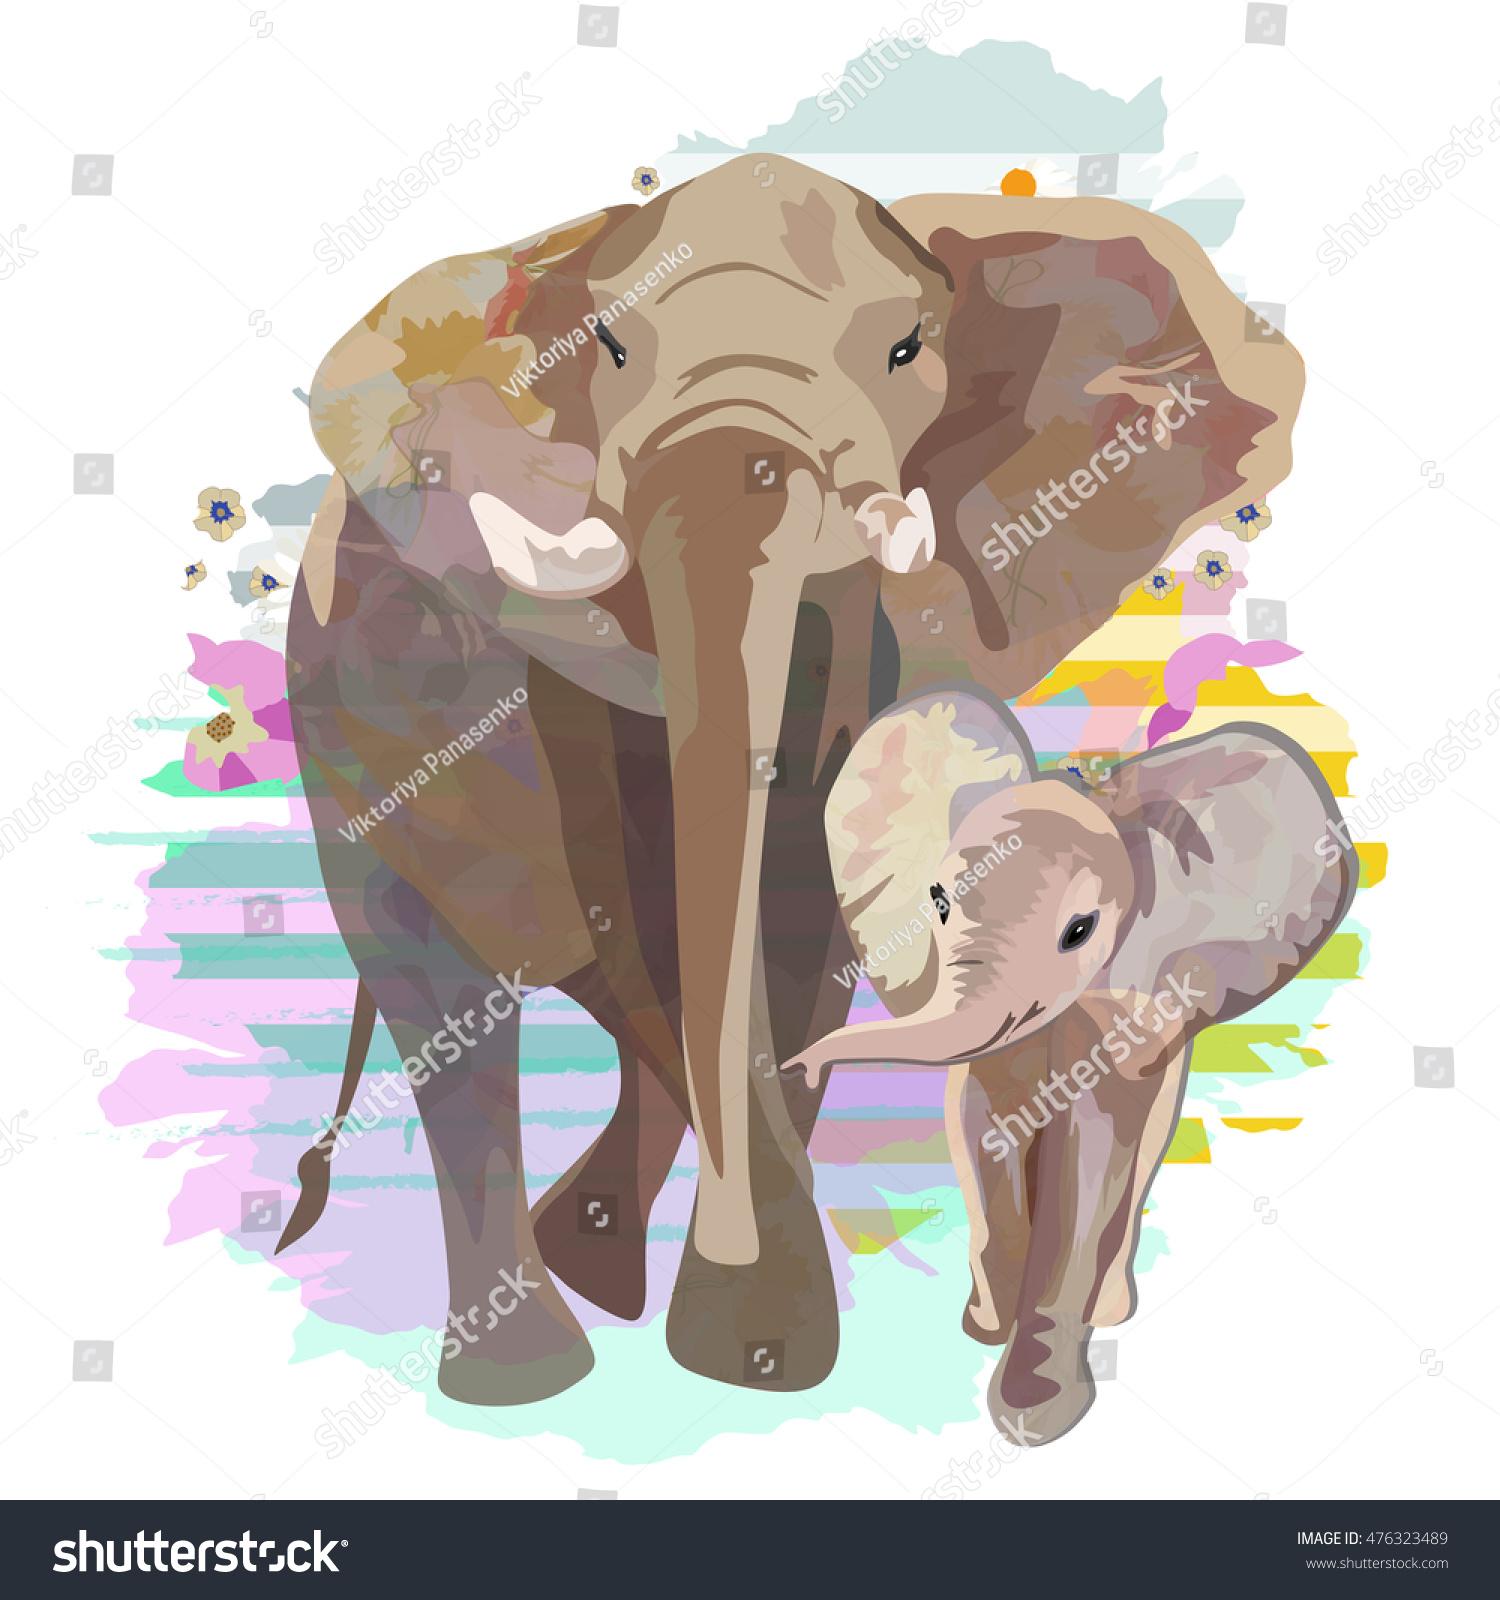 Abstract Draw Elephant Family Mom Baby Stock Vector HD (Royalty Free ...